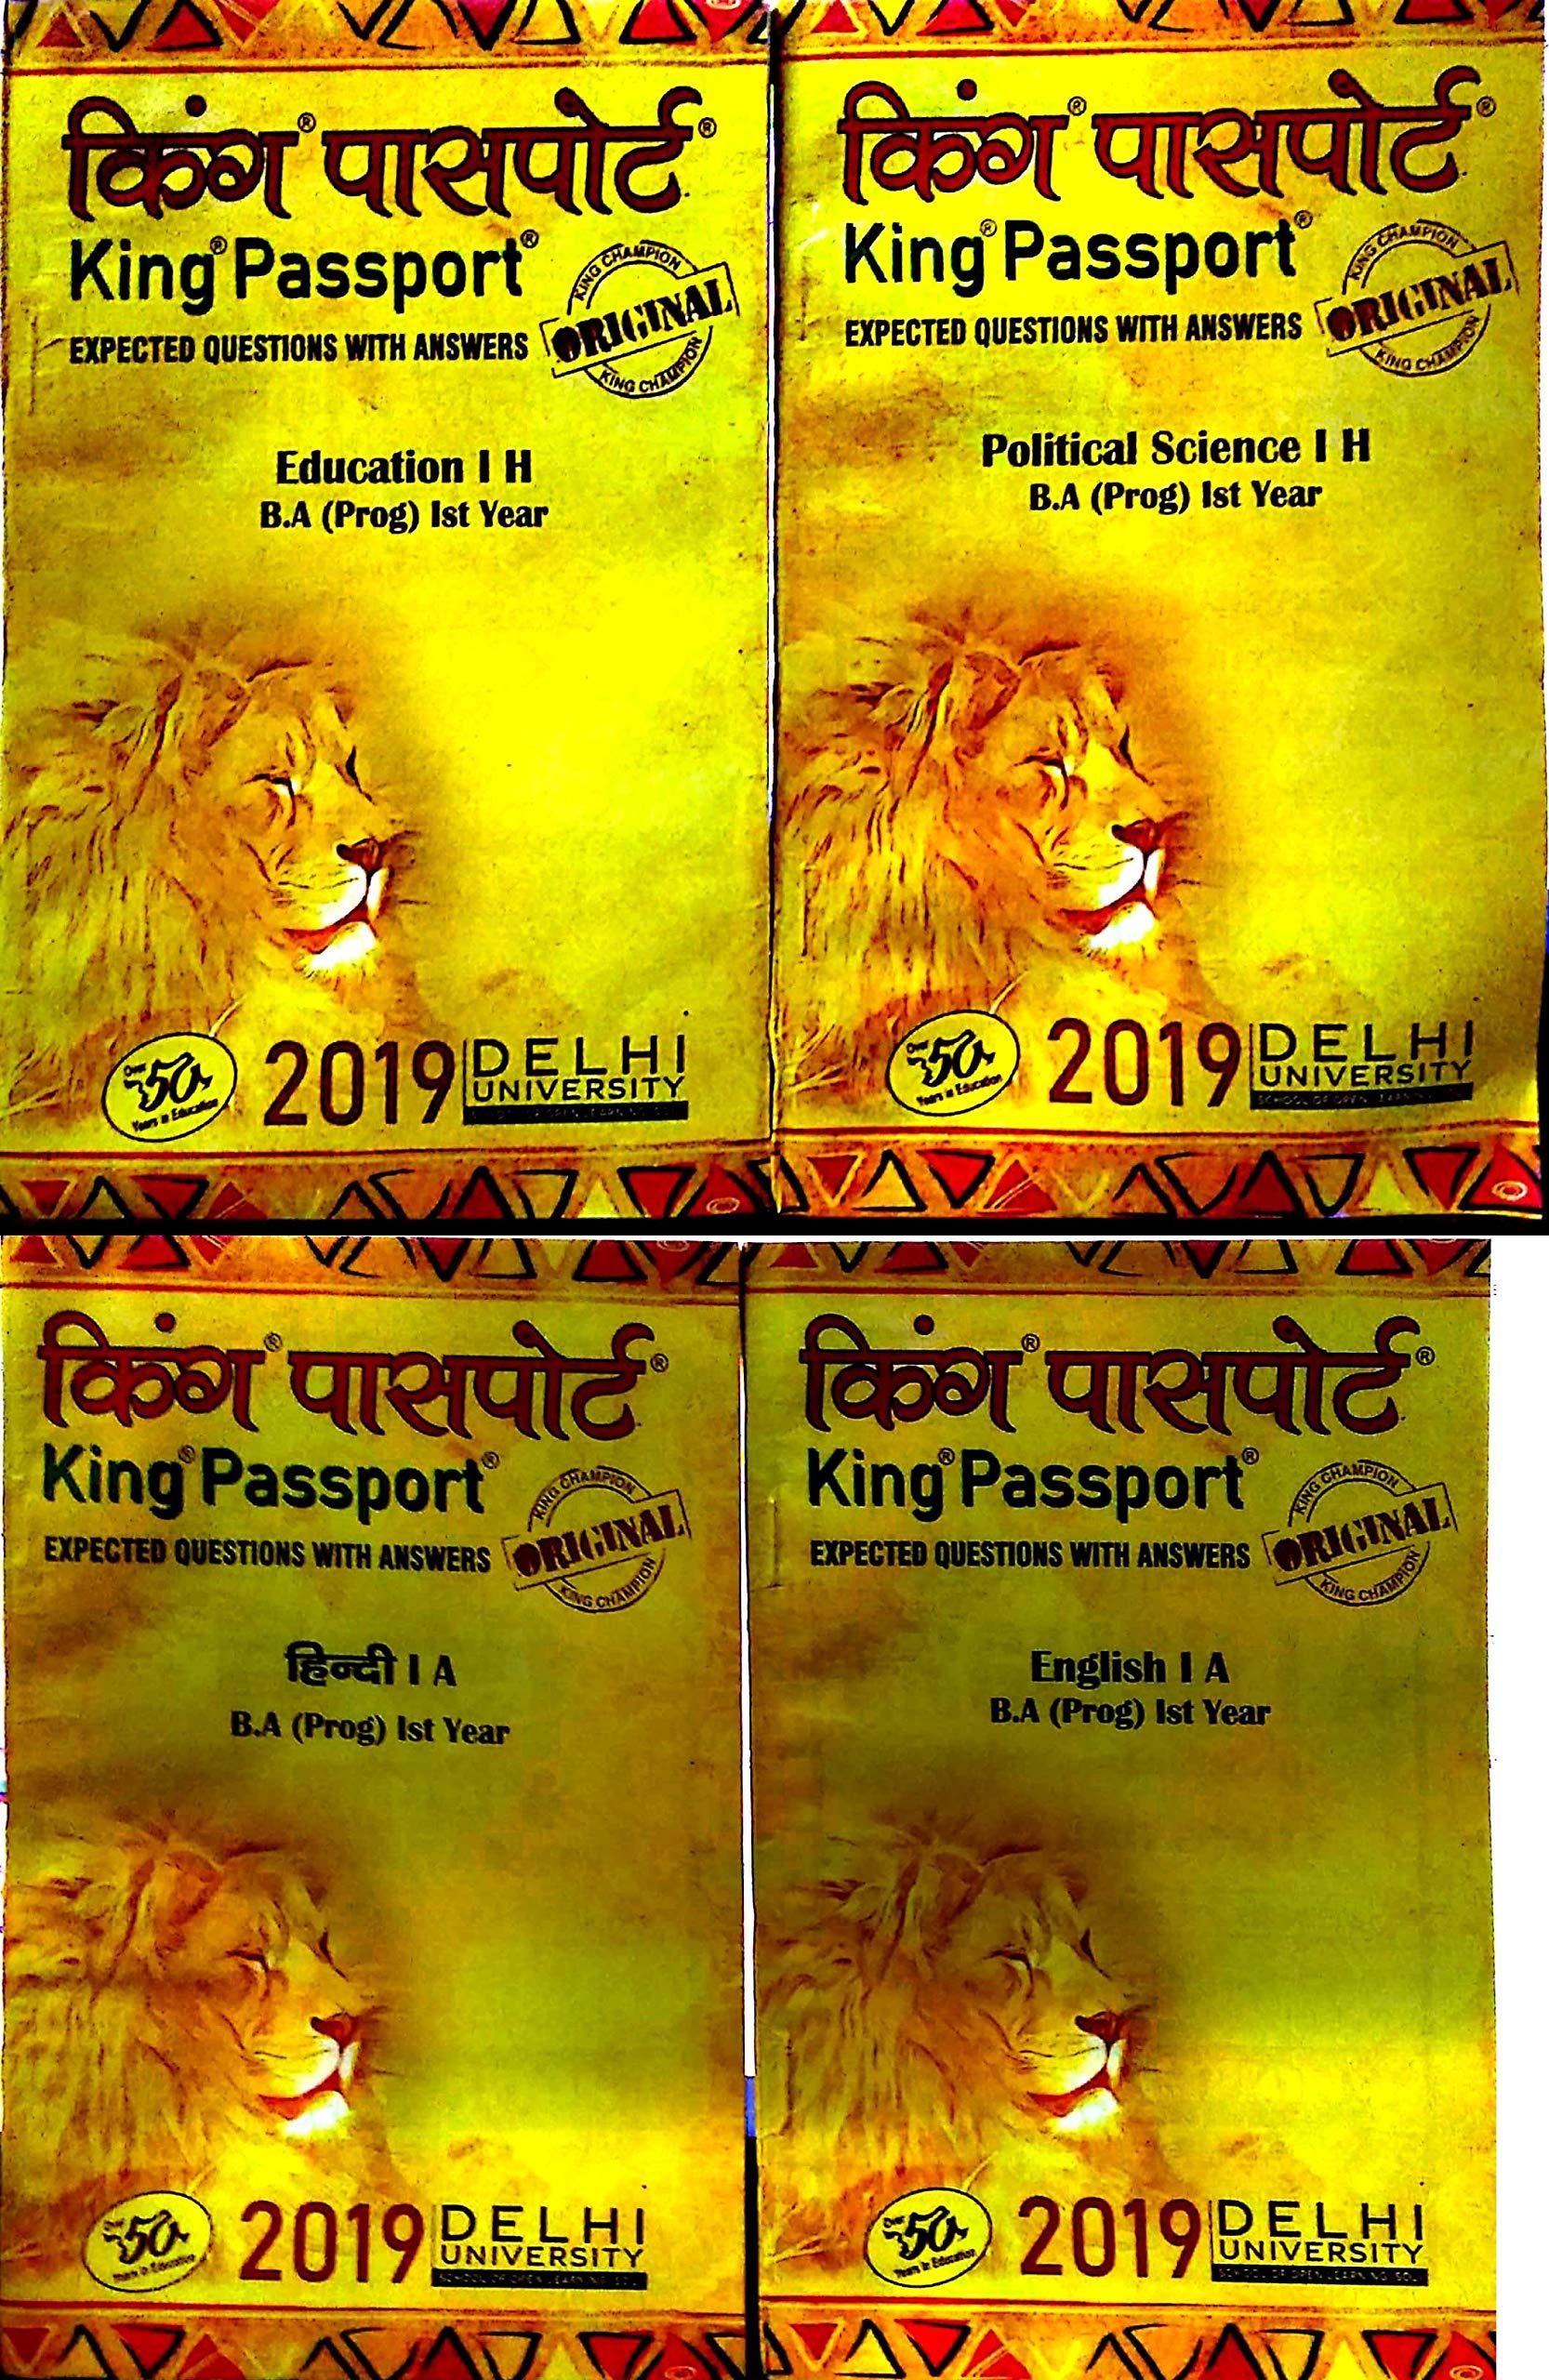 DU SOL BA Prog 1st Year Hindi Medium King Passport Hindi A, Eng A,  Rajneeti, Prachin Bharat: Amazon.in: King Champion Books: Books